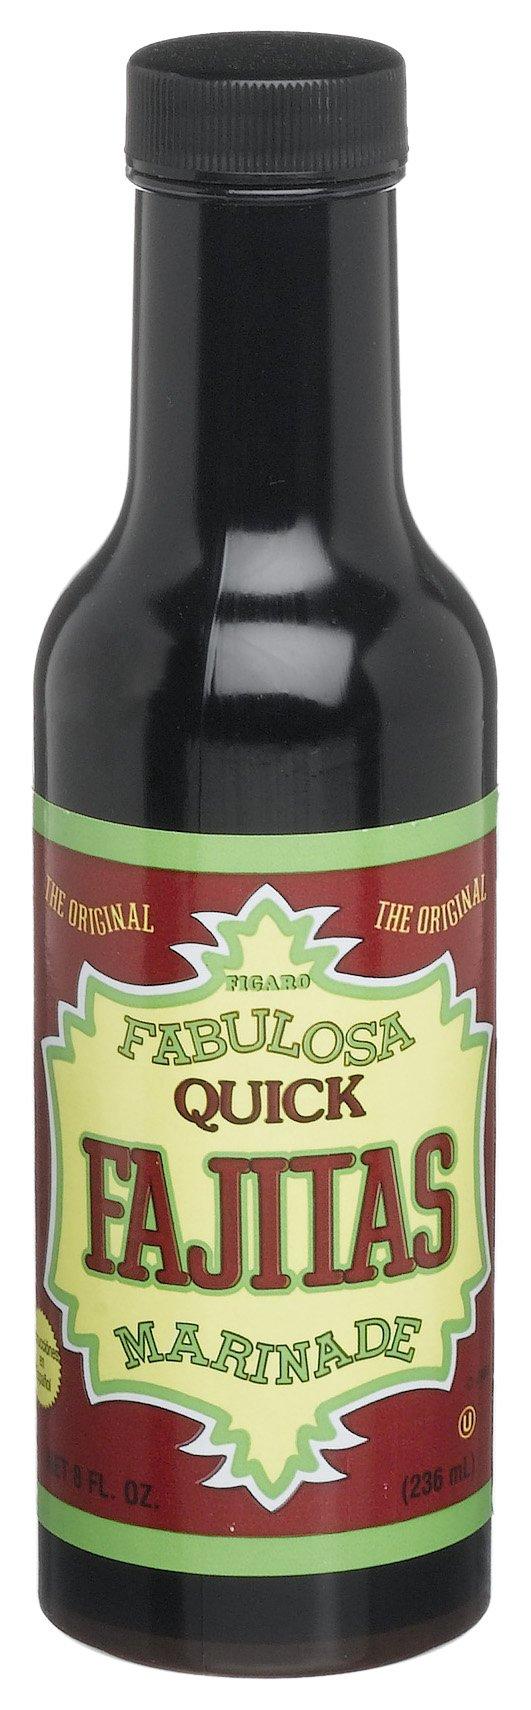 Figaro Fabulosa Fajita Marinade, 8-Ounce Platic Bottles (Pack of 12)